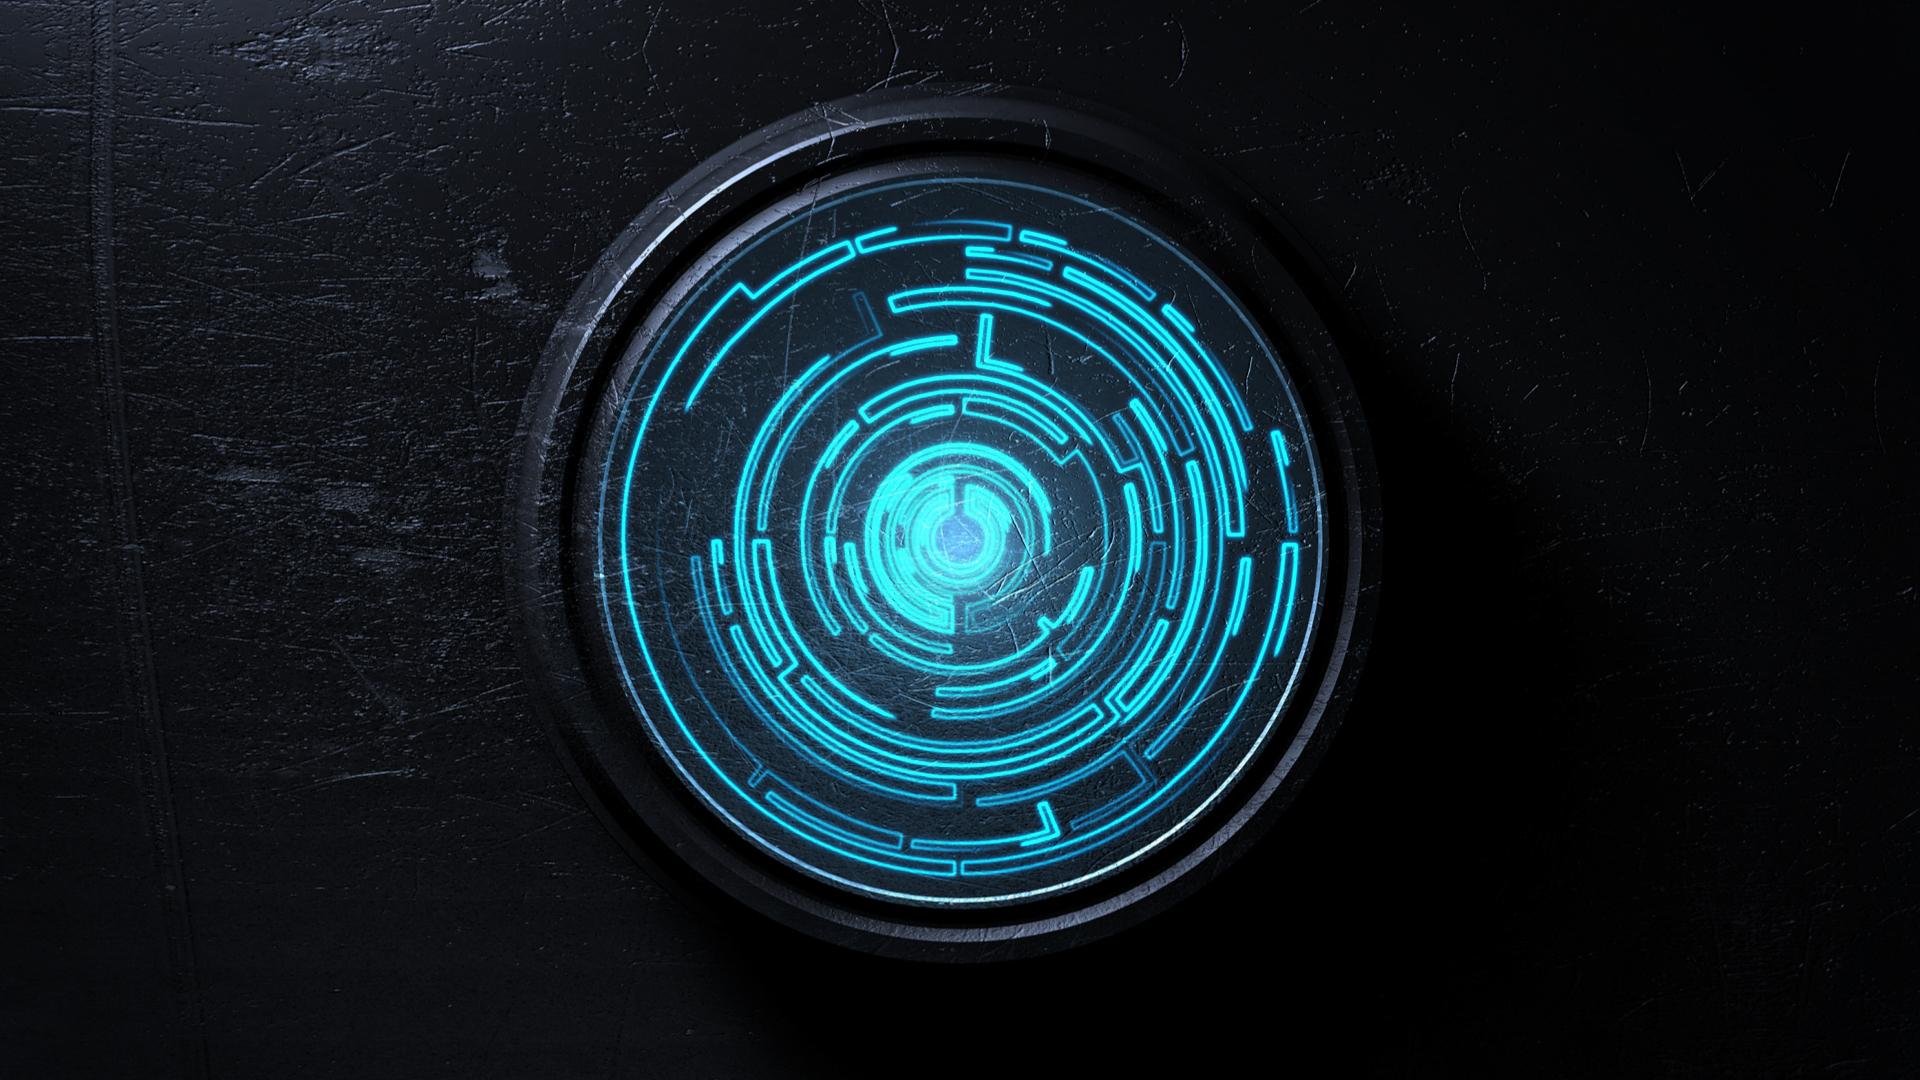 Wallpaper Spiral Sphere Logo Symmetry Blue Circle Vortex